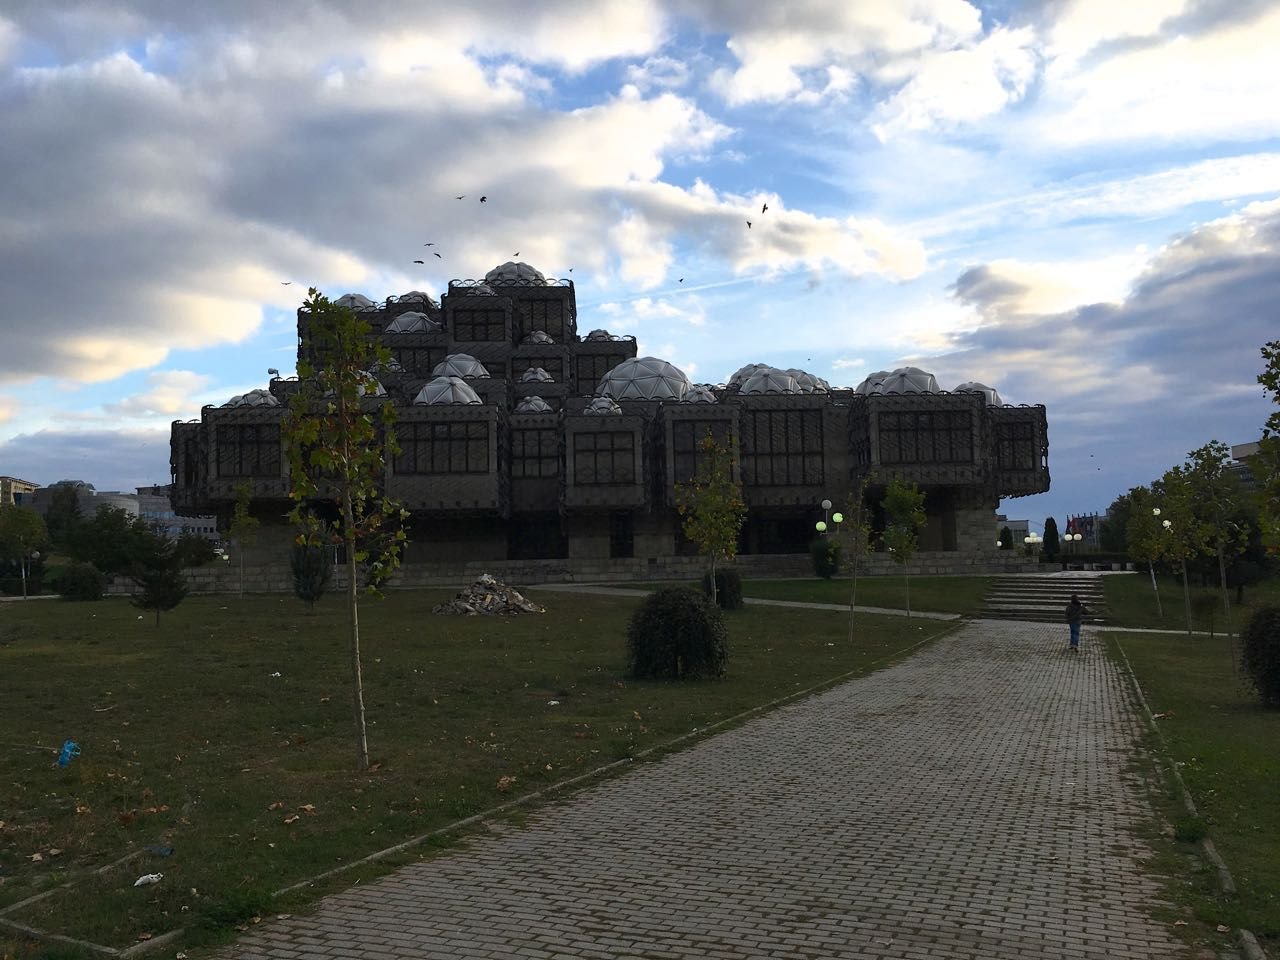 De brutalistische bieb van Pristina Gebouwen, Brutalisme